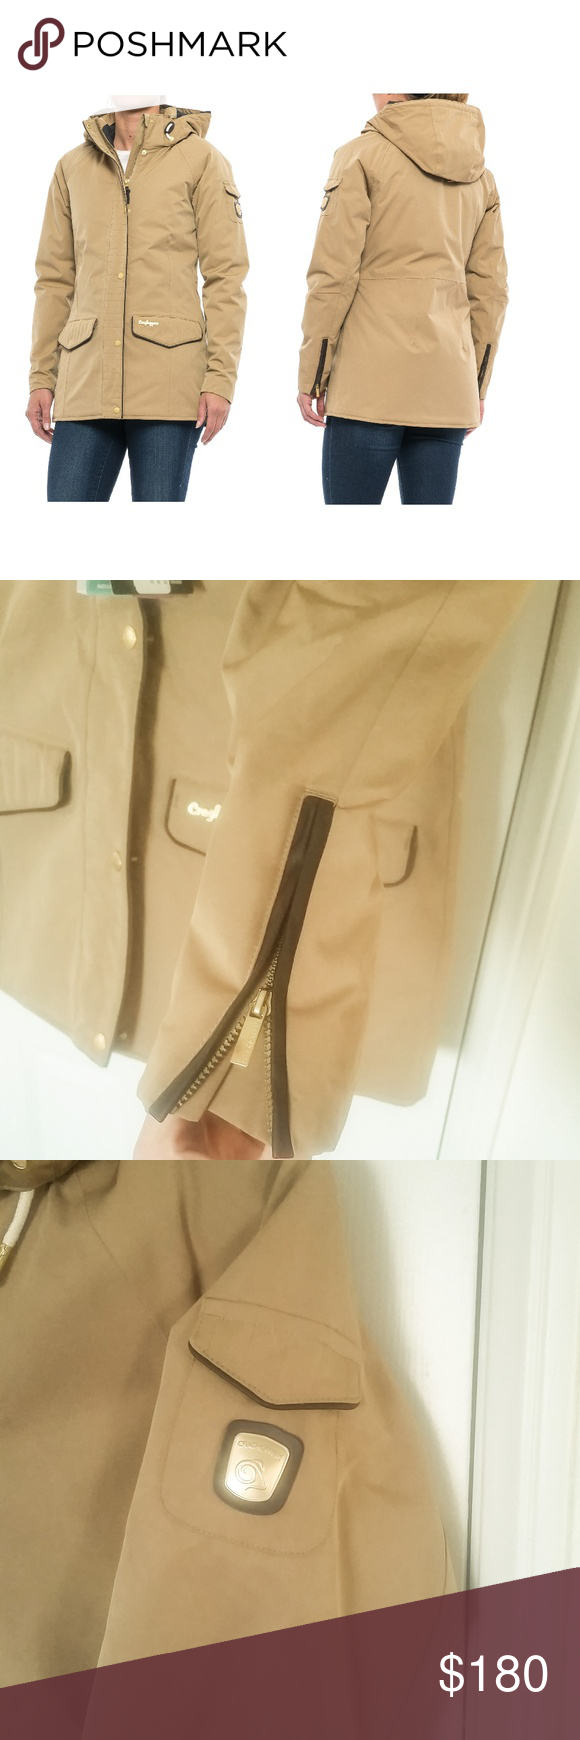 Natgeo Craghoppers 250 Insulated Jacket Xs Nwt Jackets Clothes Design Jackets Coats